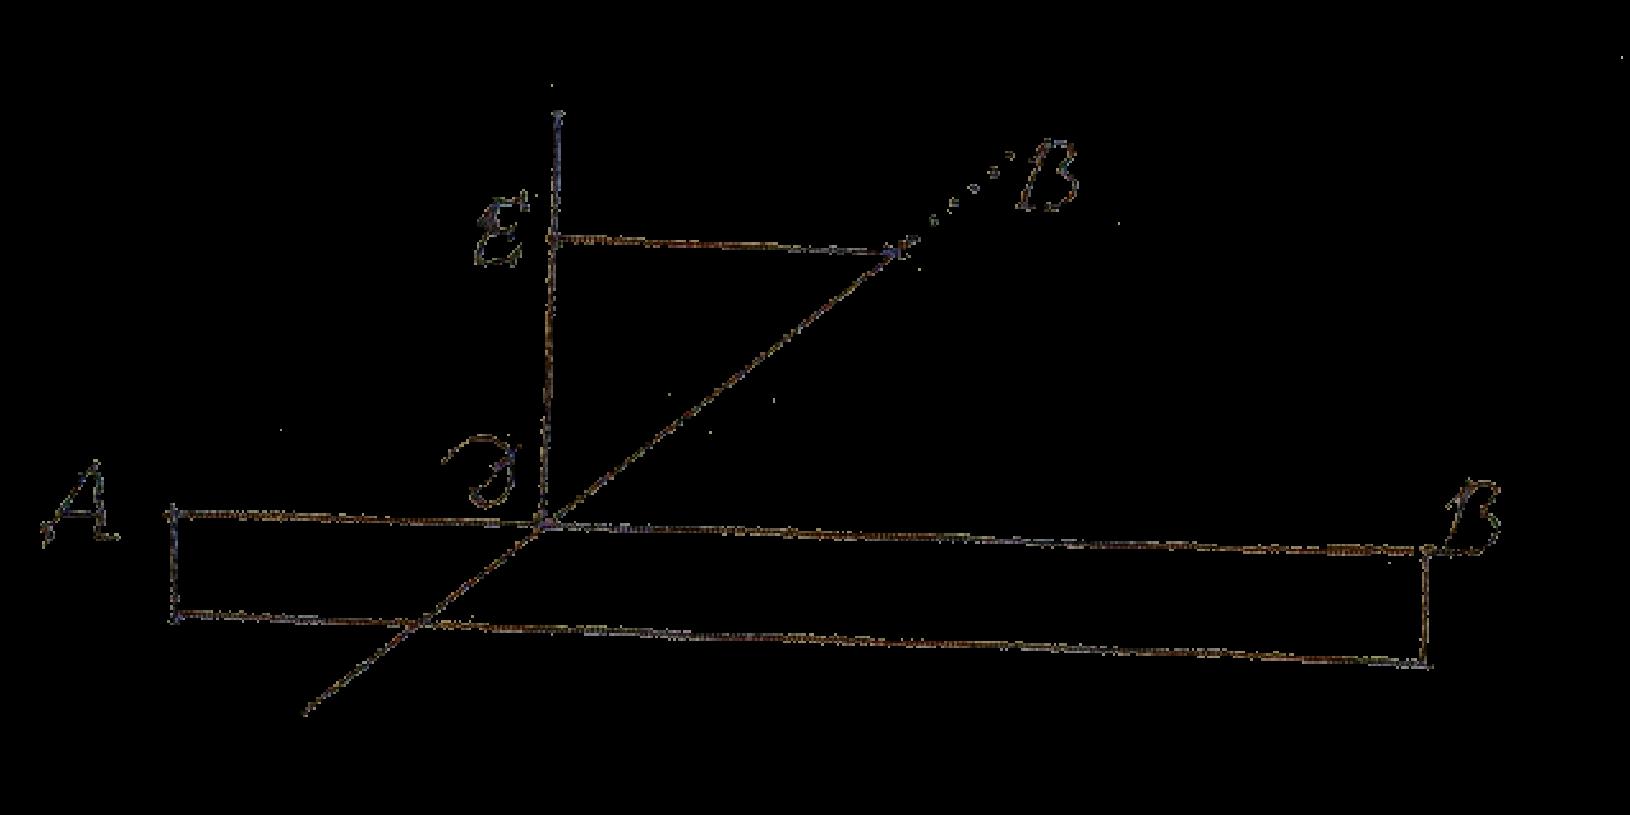 [Figure 4]